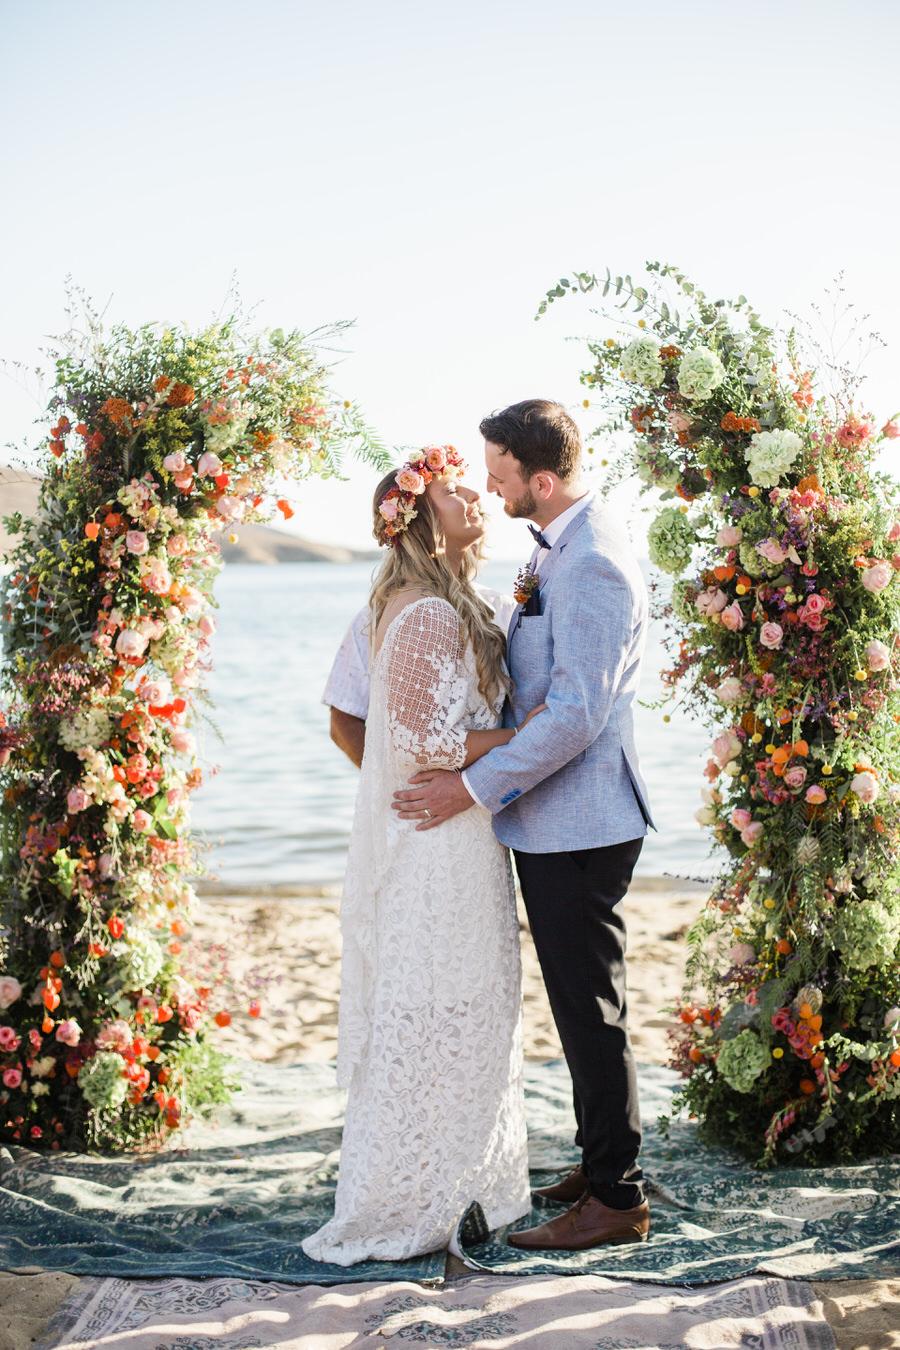 Top Reviews Wedding Wire Couples' Choice Awards for Fiorello Photography Monika Kritikou